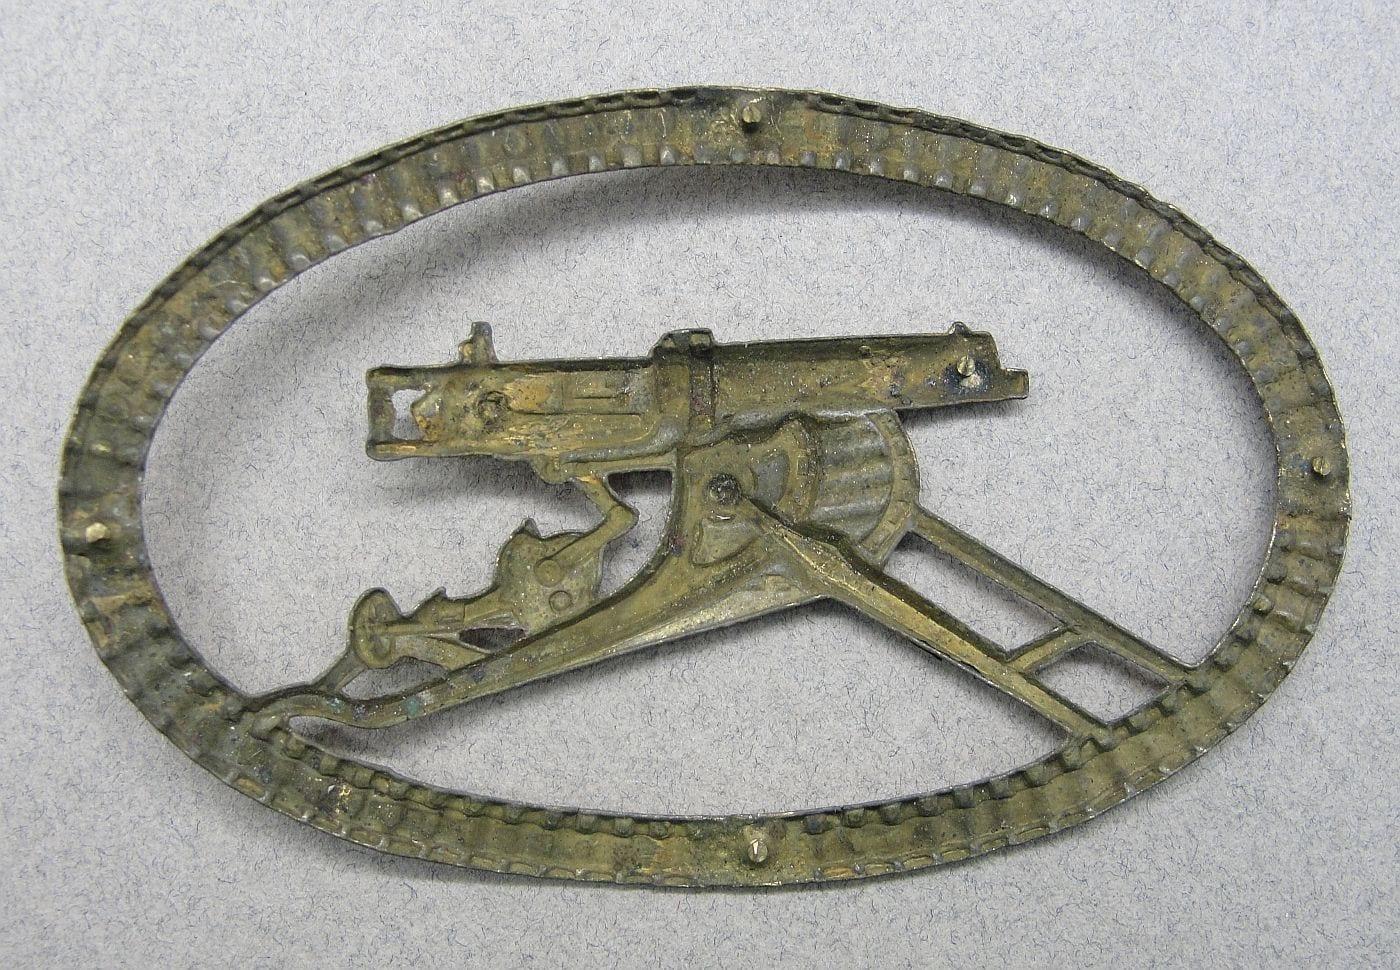 WW1 German Machine Gunner's Badge by Carl Leeburg